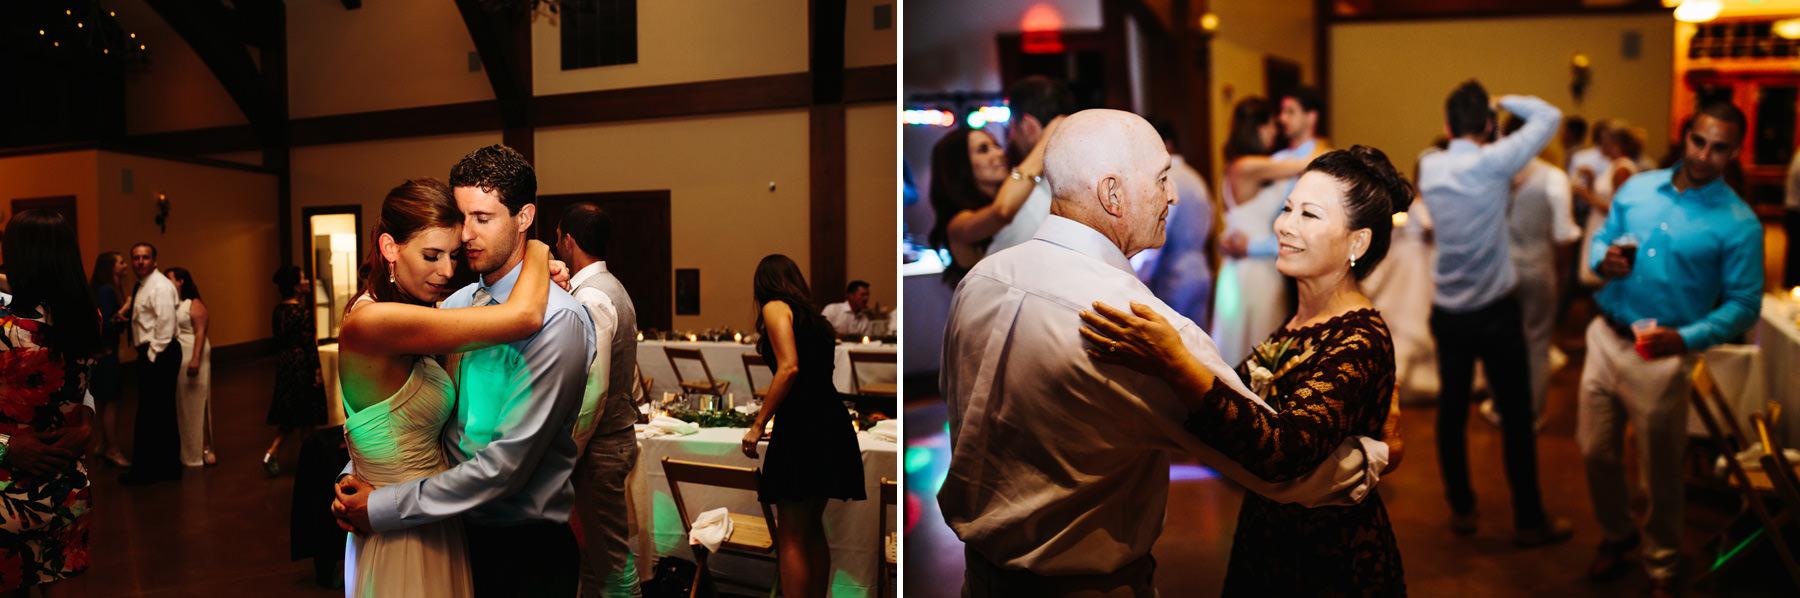 Vail Colorado Wedding Deck_ Kindling Wedding Photography88.JPG